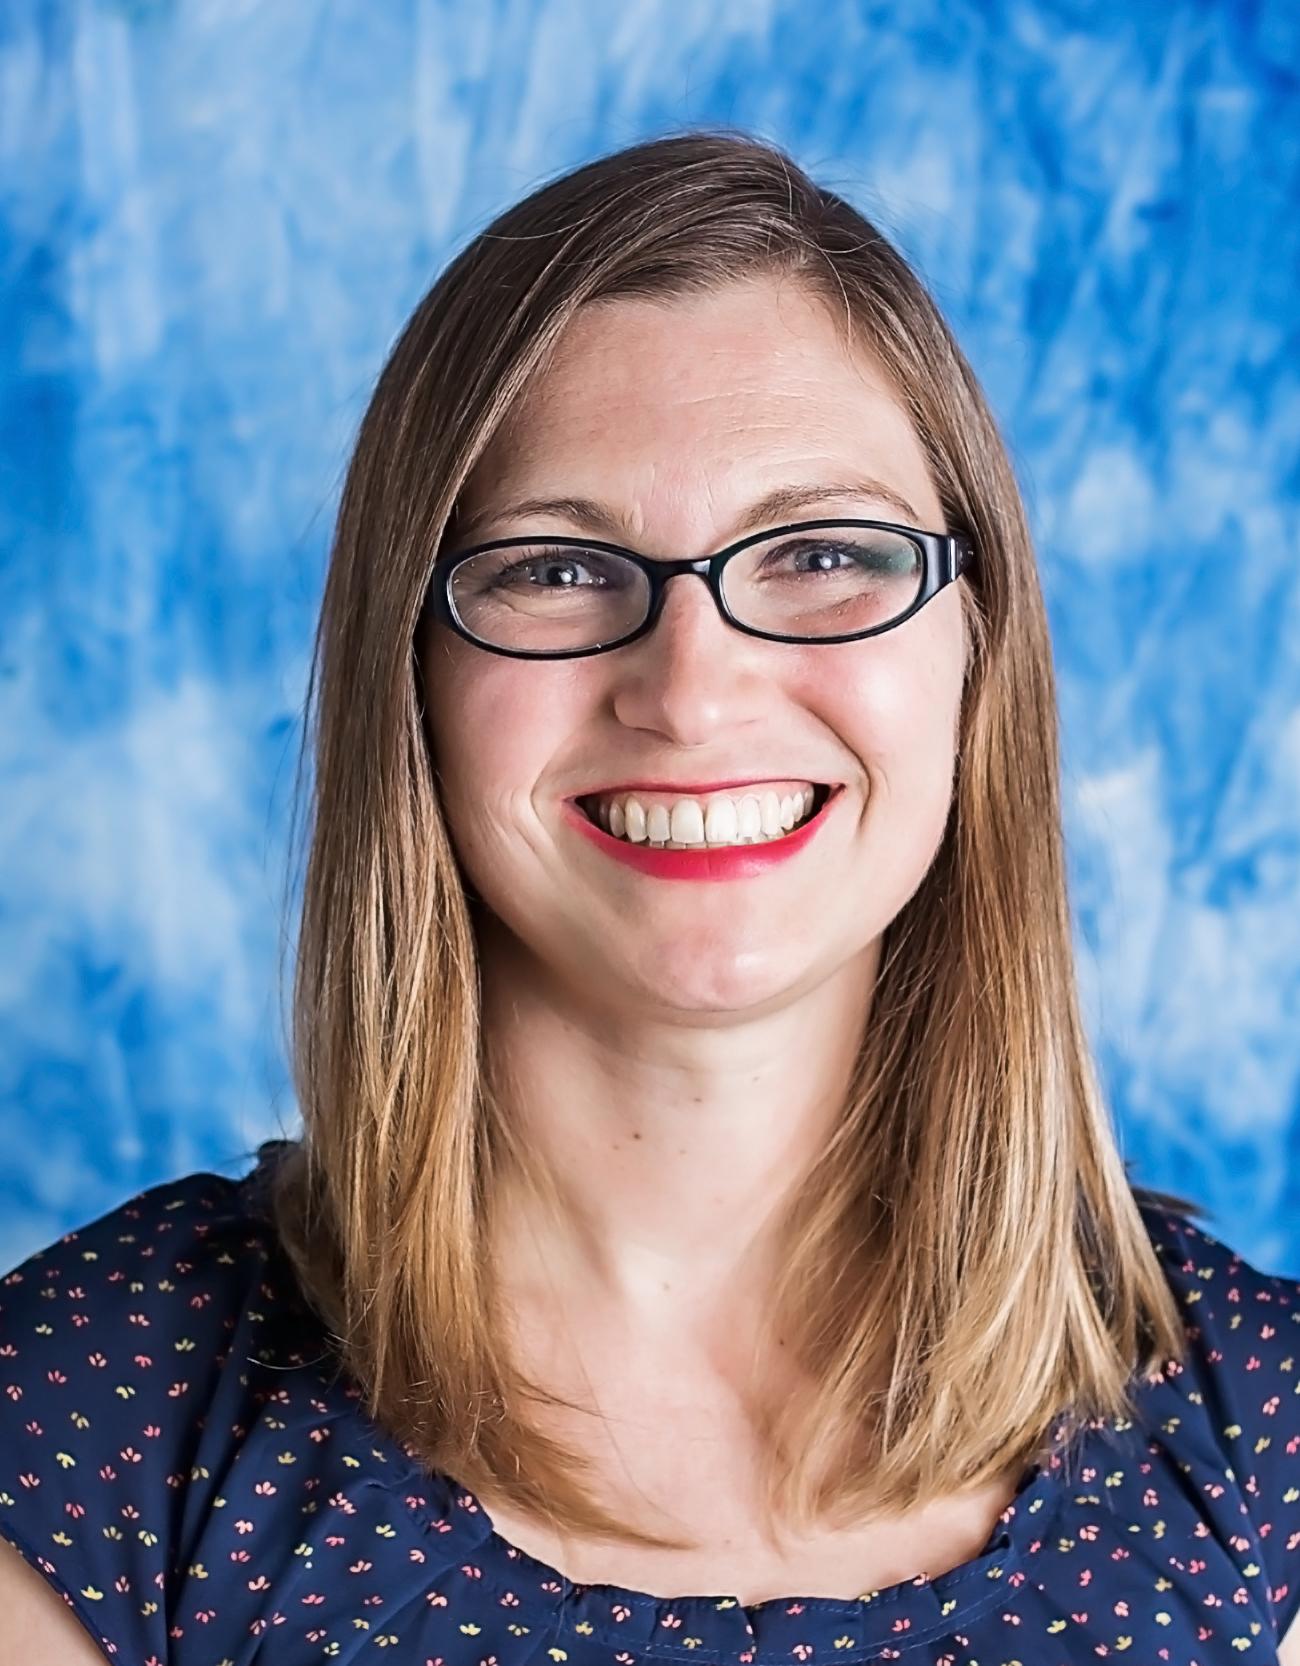 Beth Hospodarsky